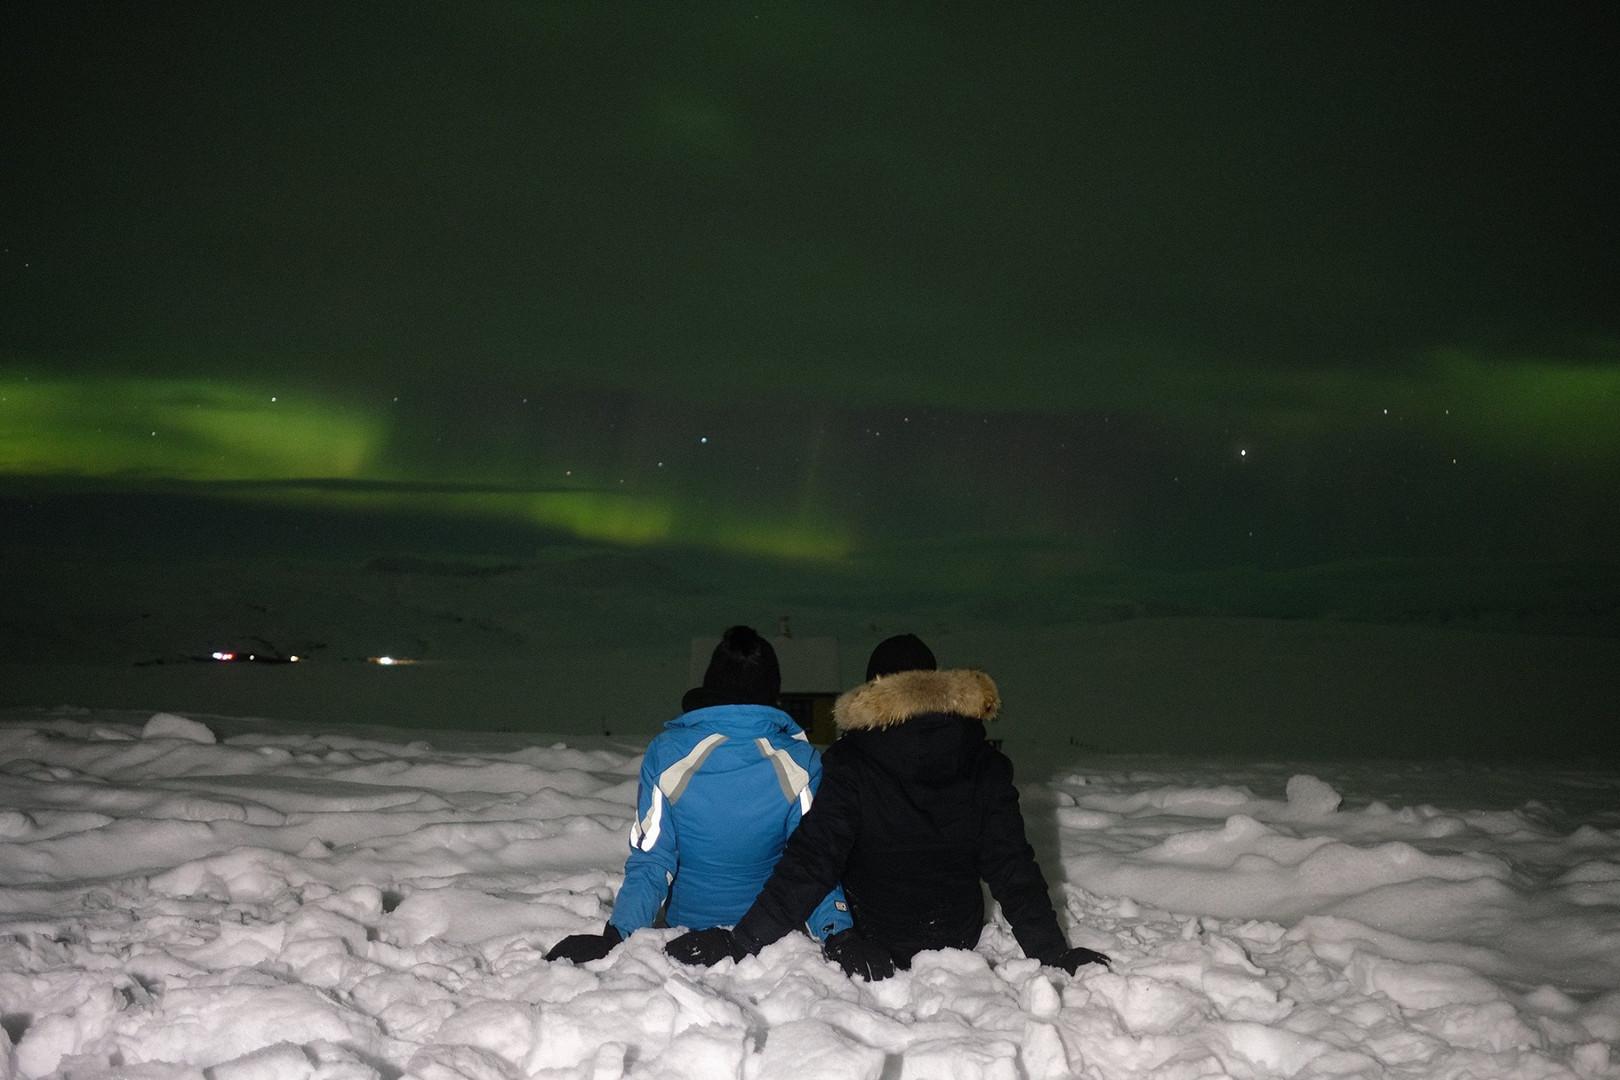 northern lights small group expiriance